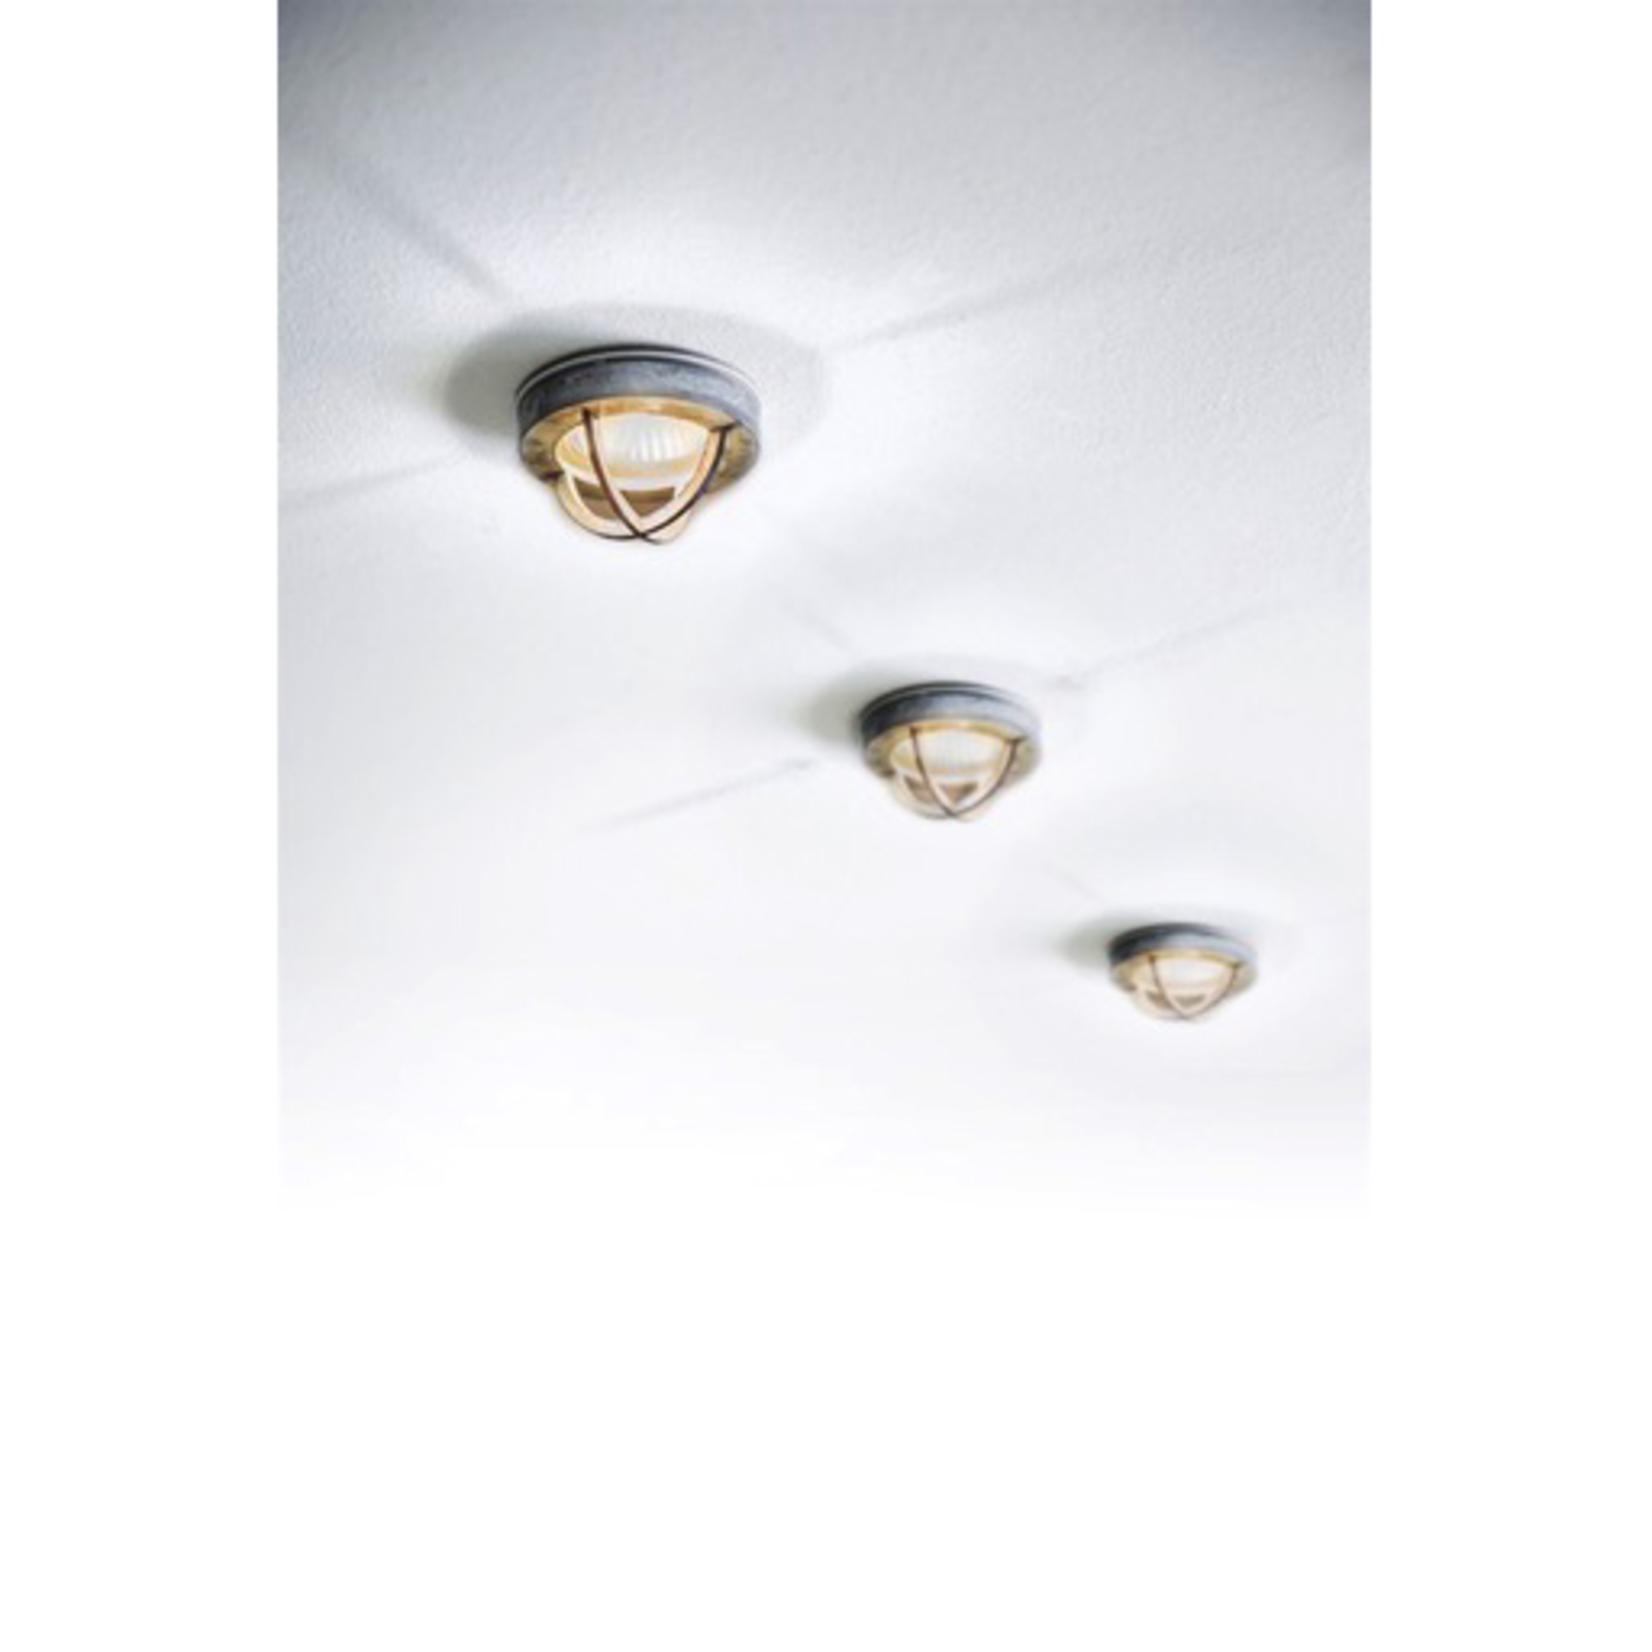 GT Chamonix Spotlight wall or ceiling